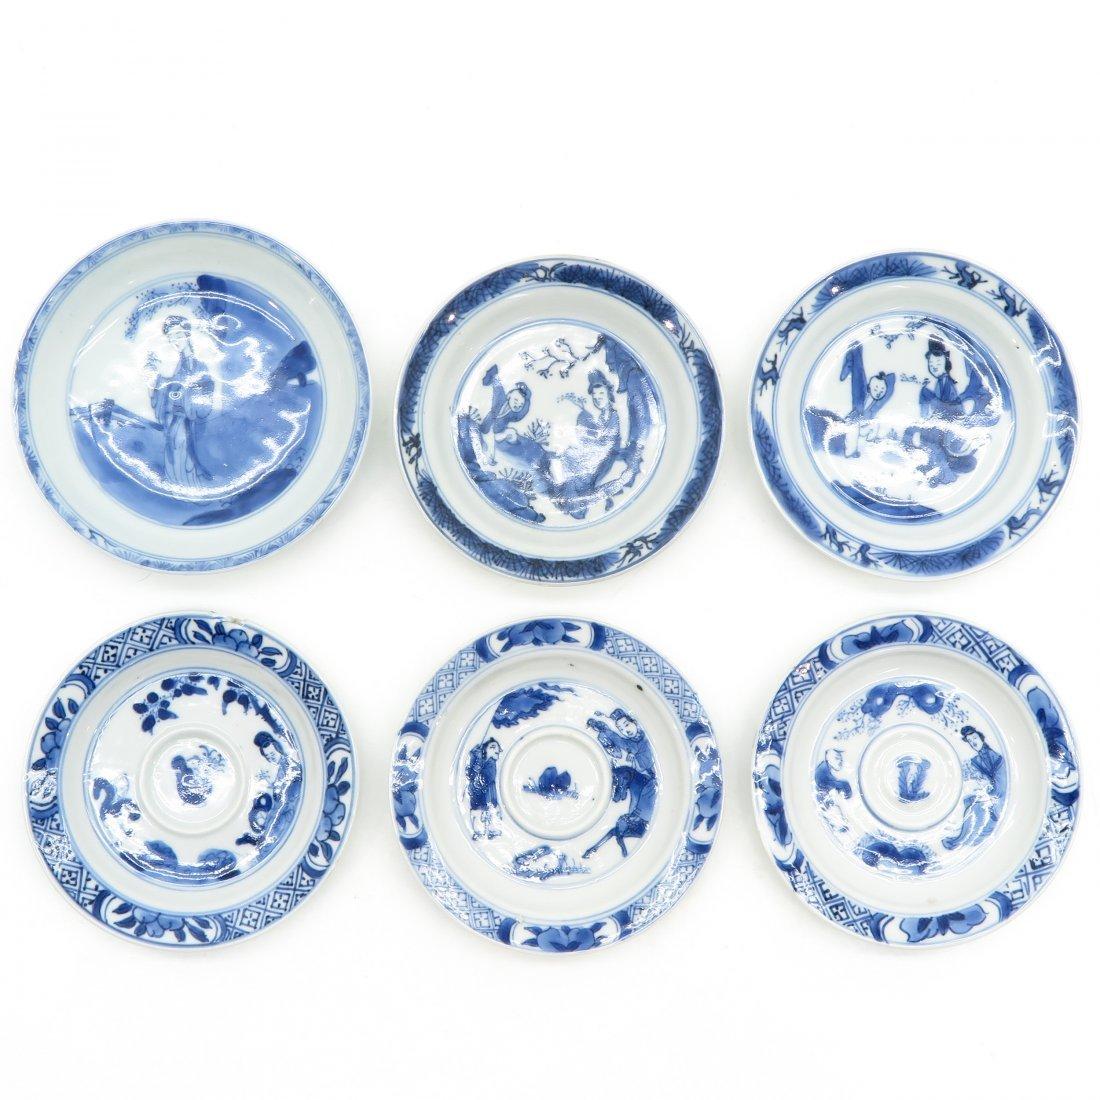 Lot of 6 China Porcelain Plates